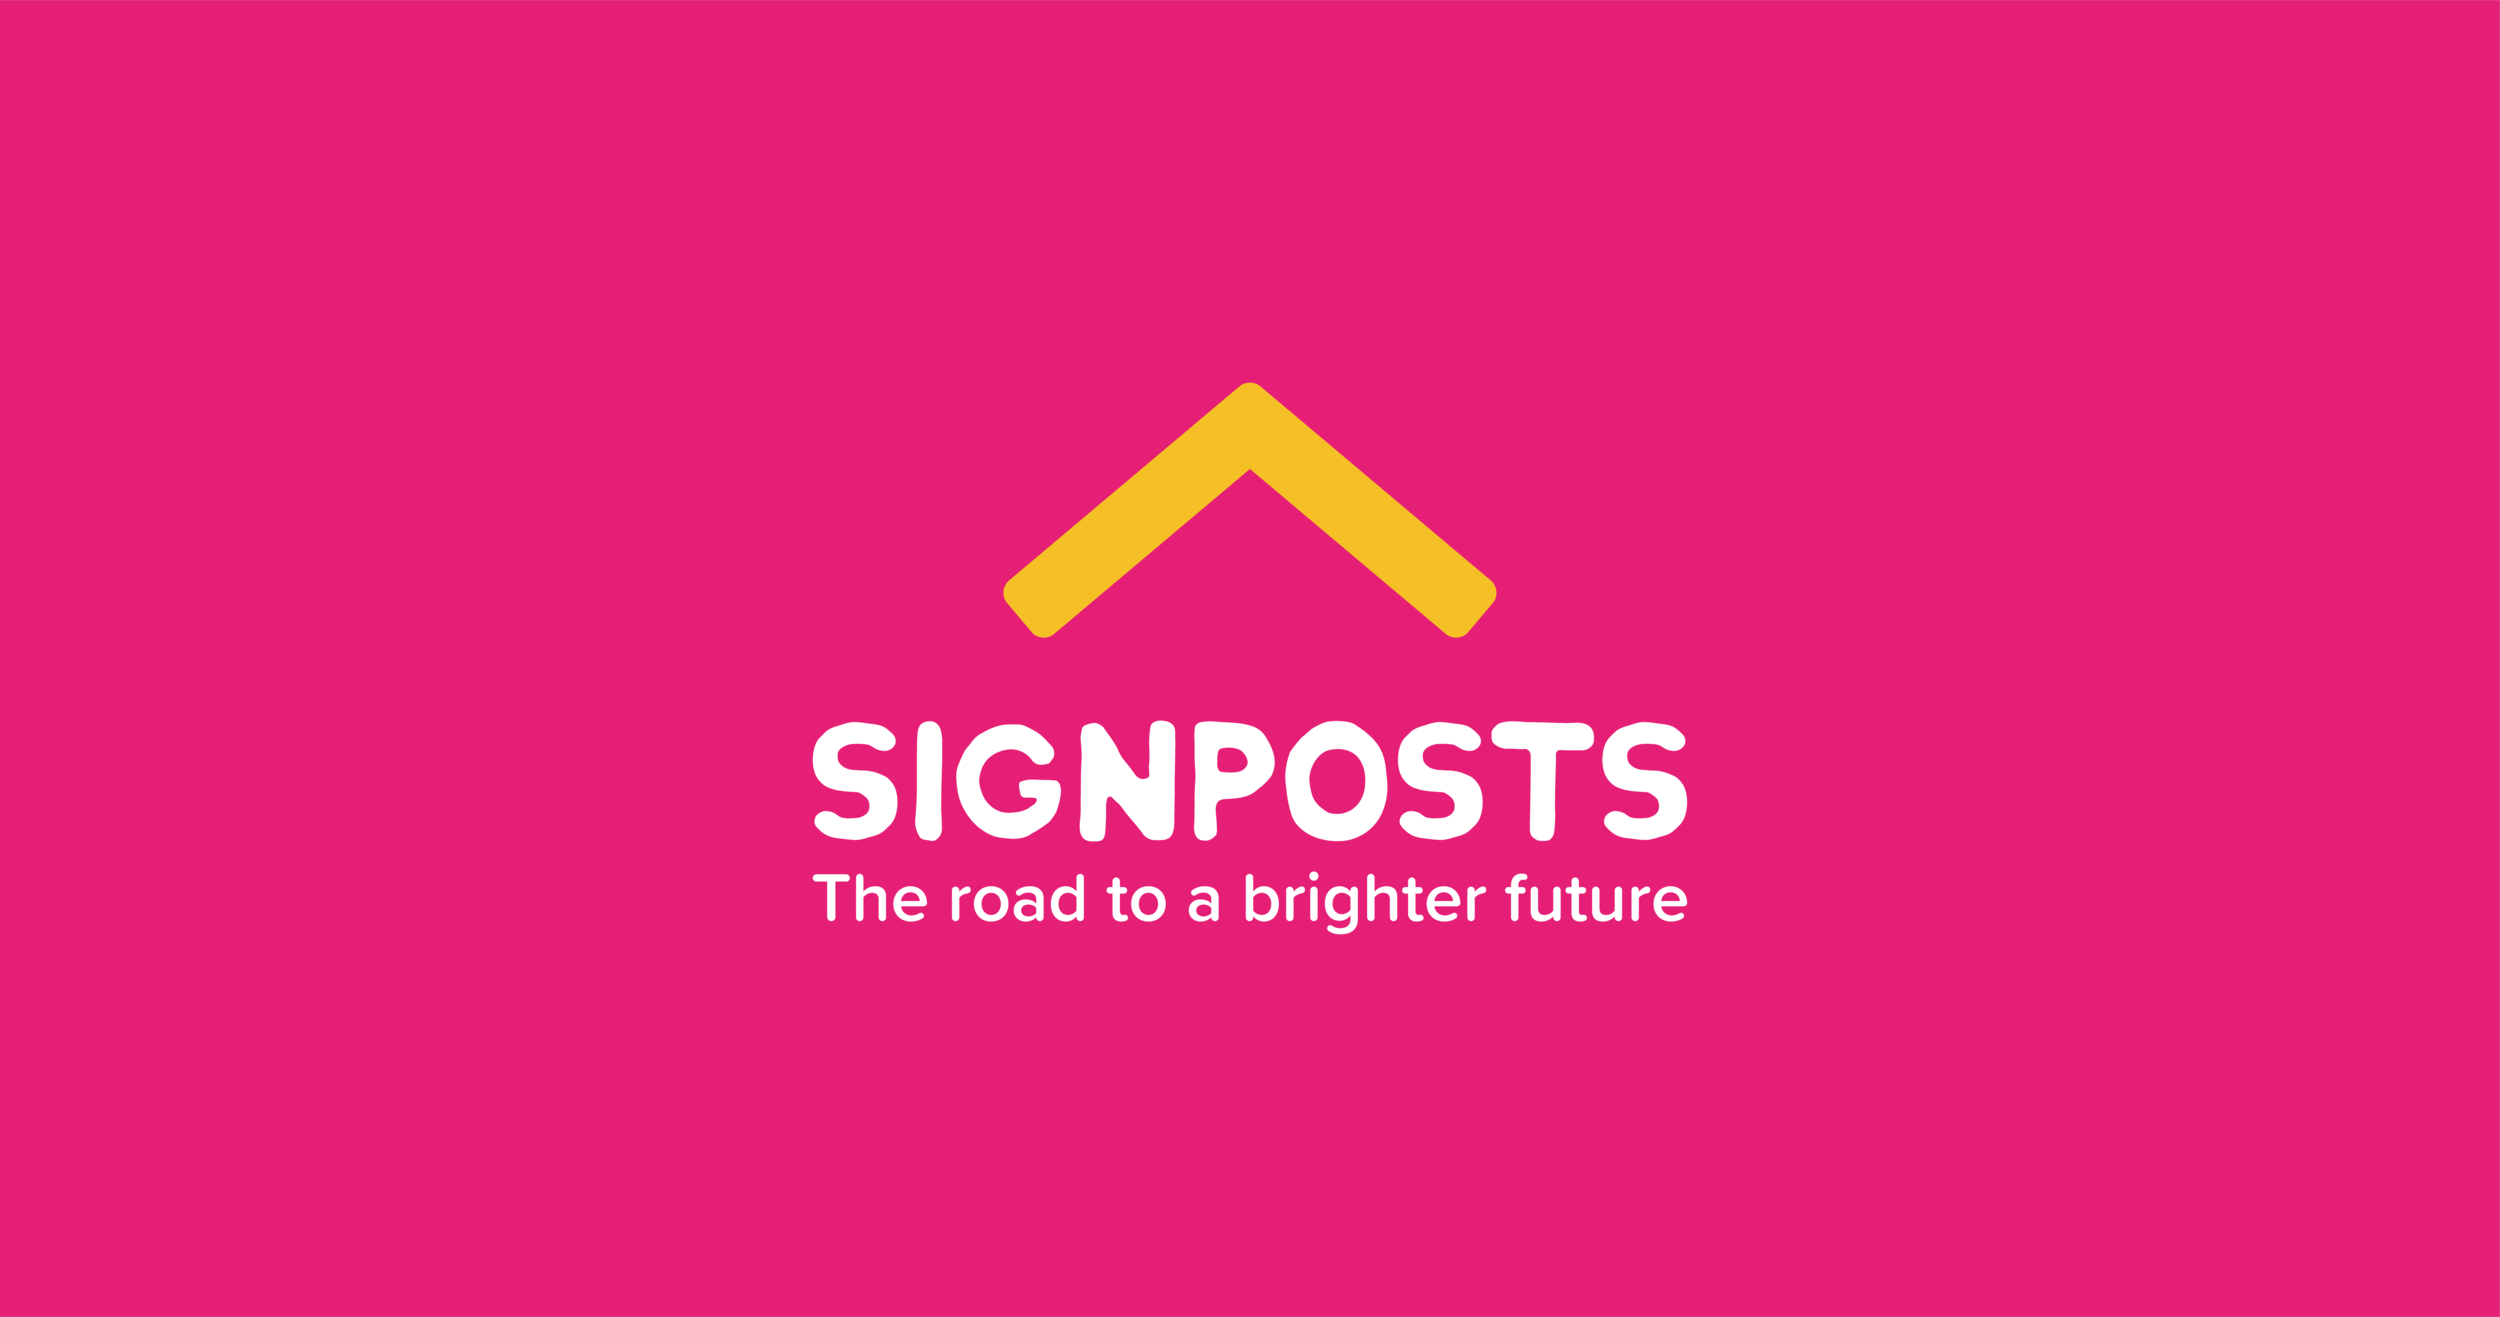 Signposts_logo design-04.png